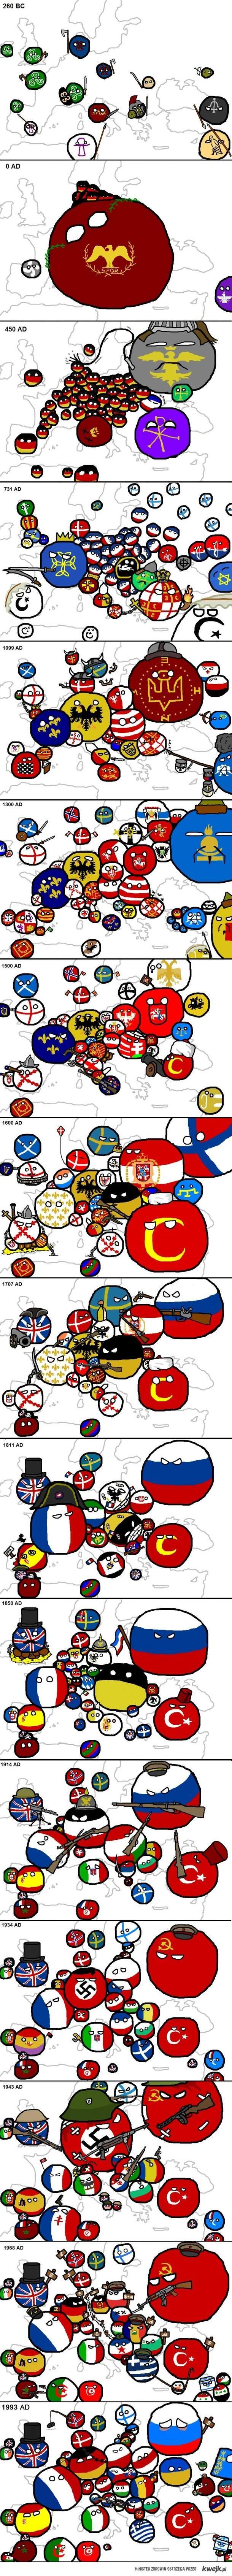 Historia Europy - KWEJK.pl